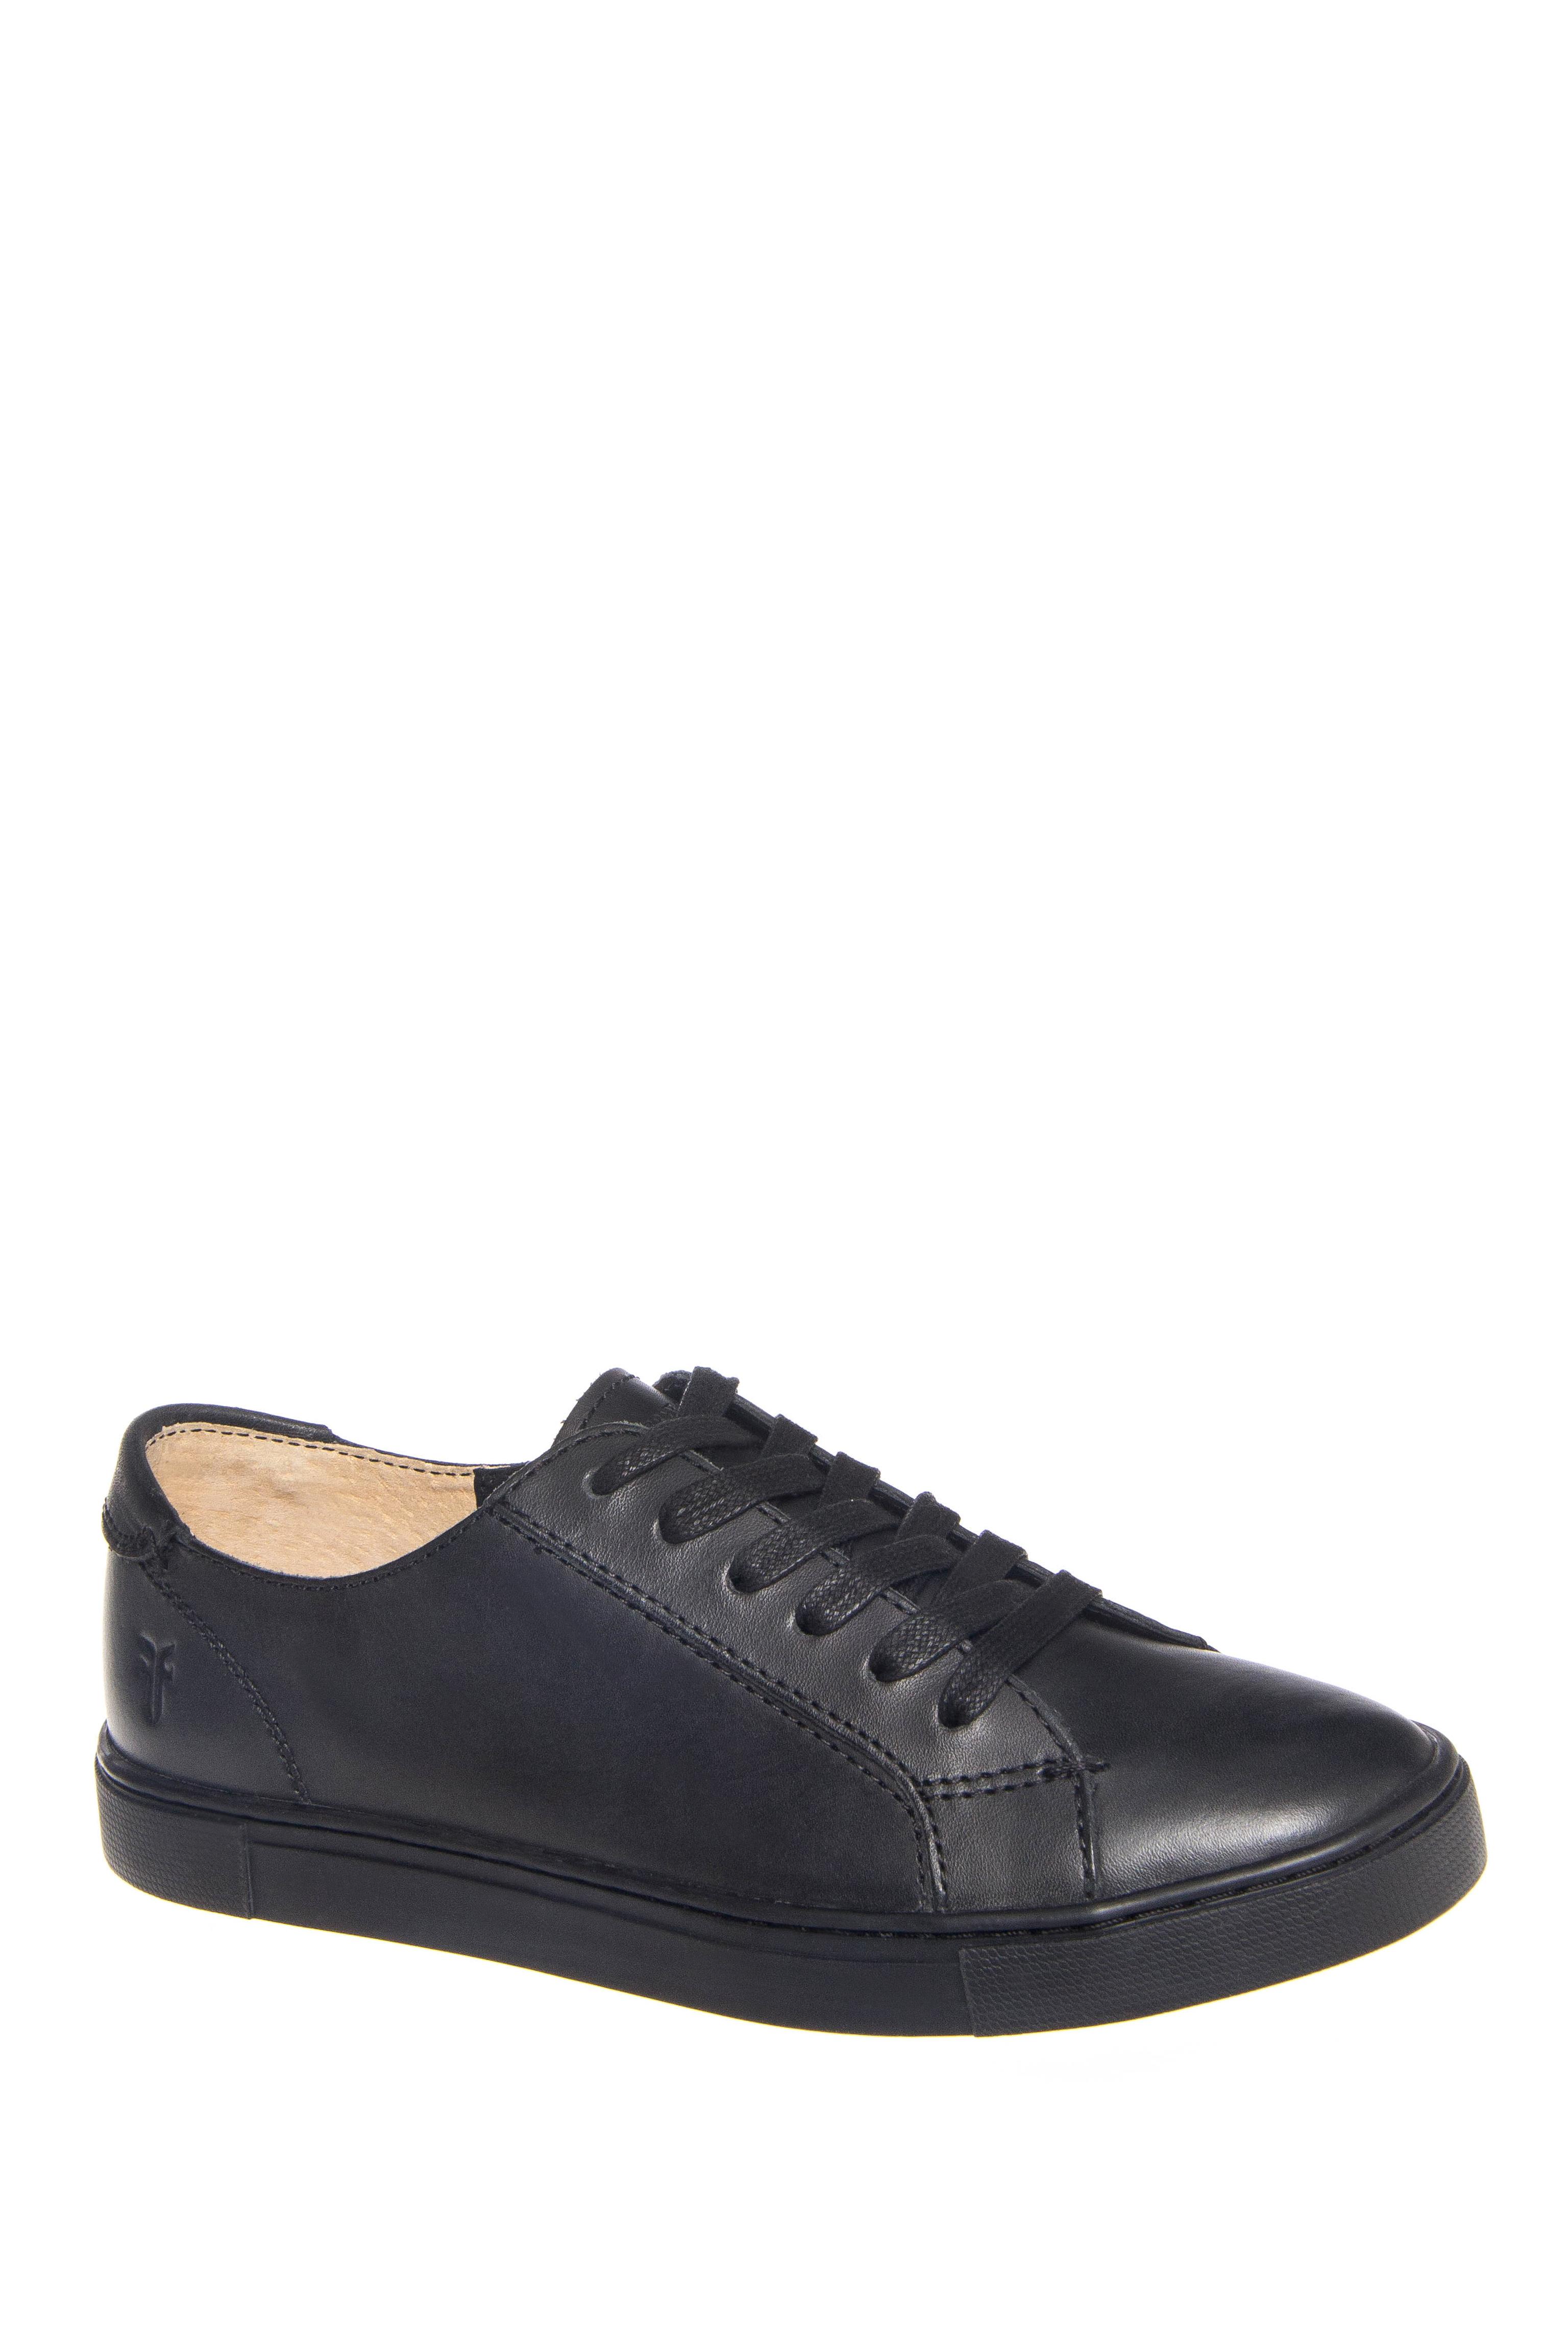 Frye Gemma Low Top Sneakers - Black